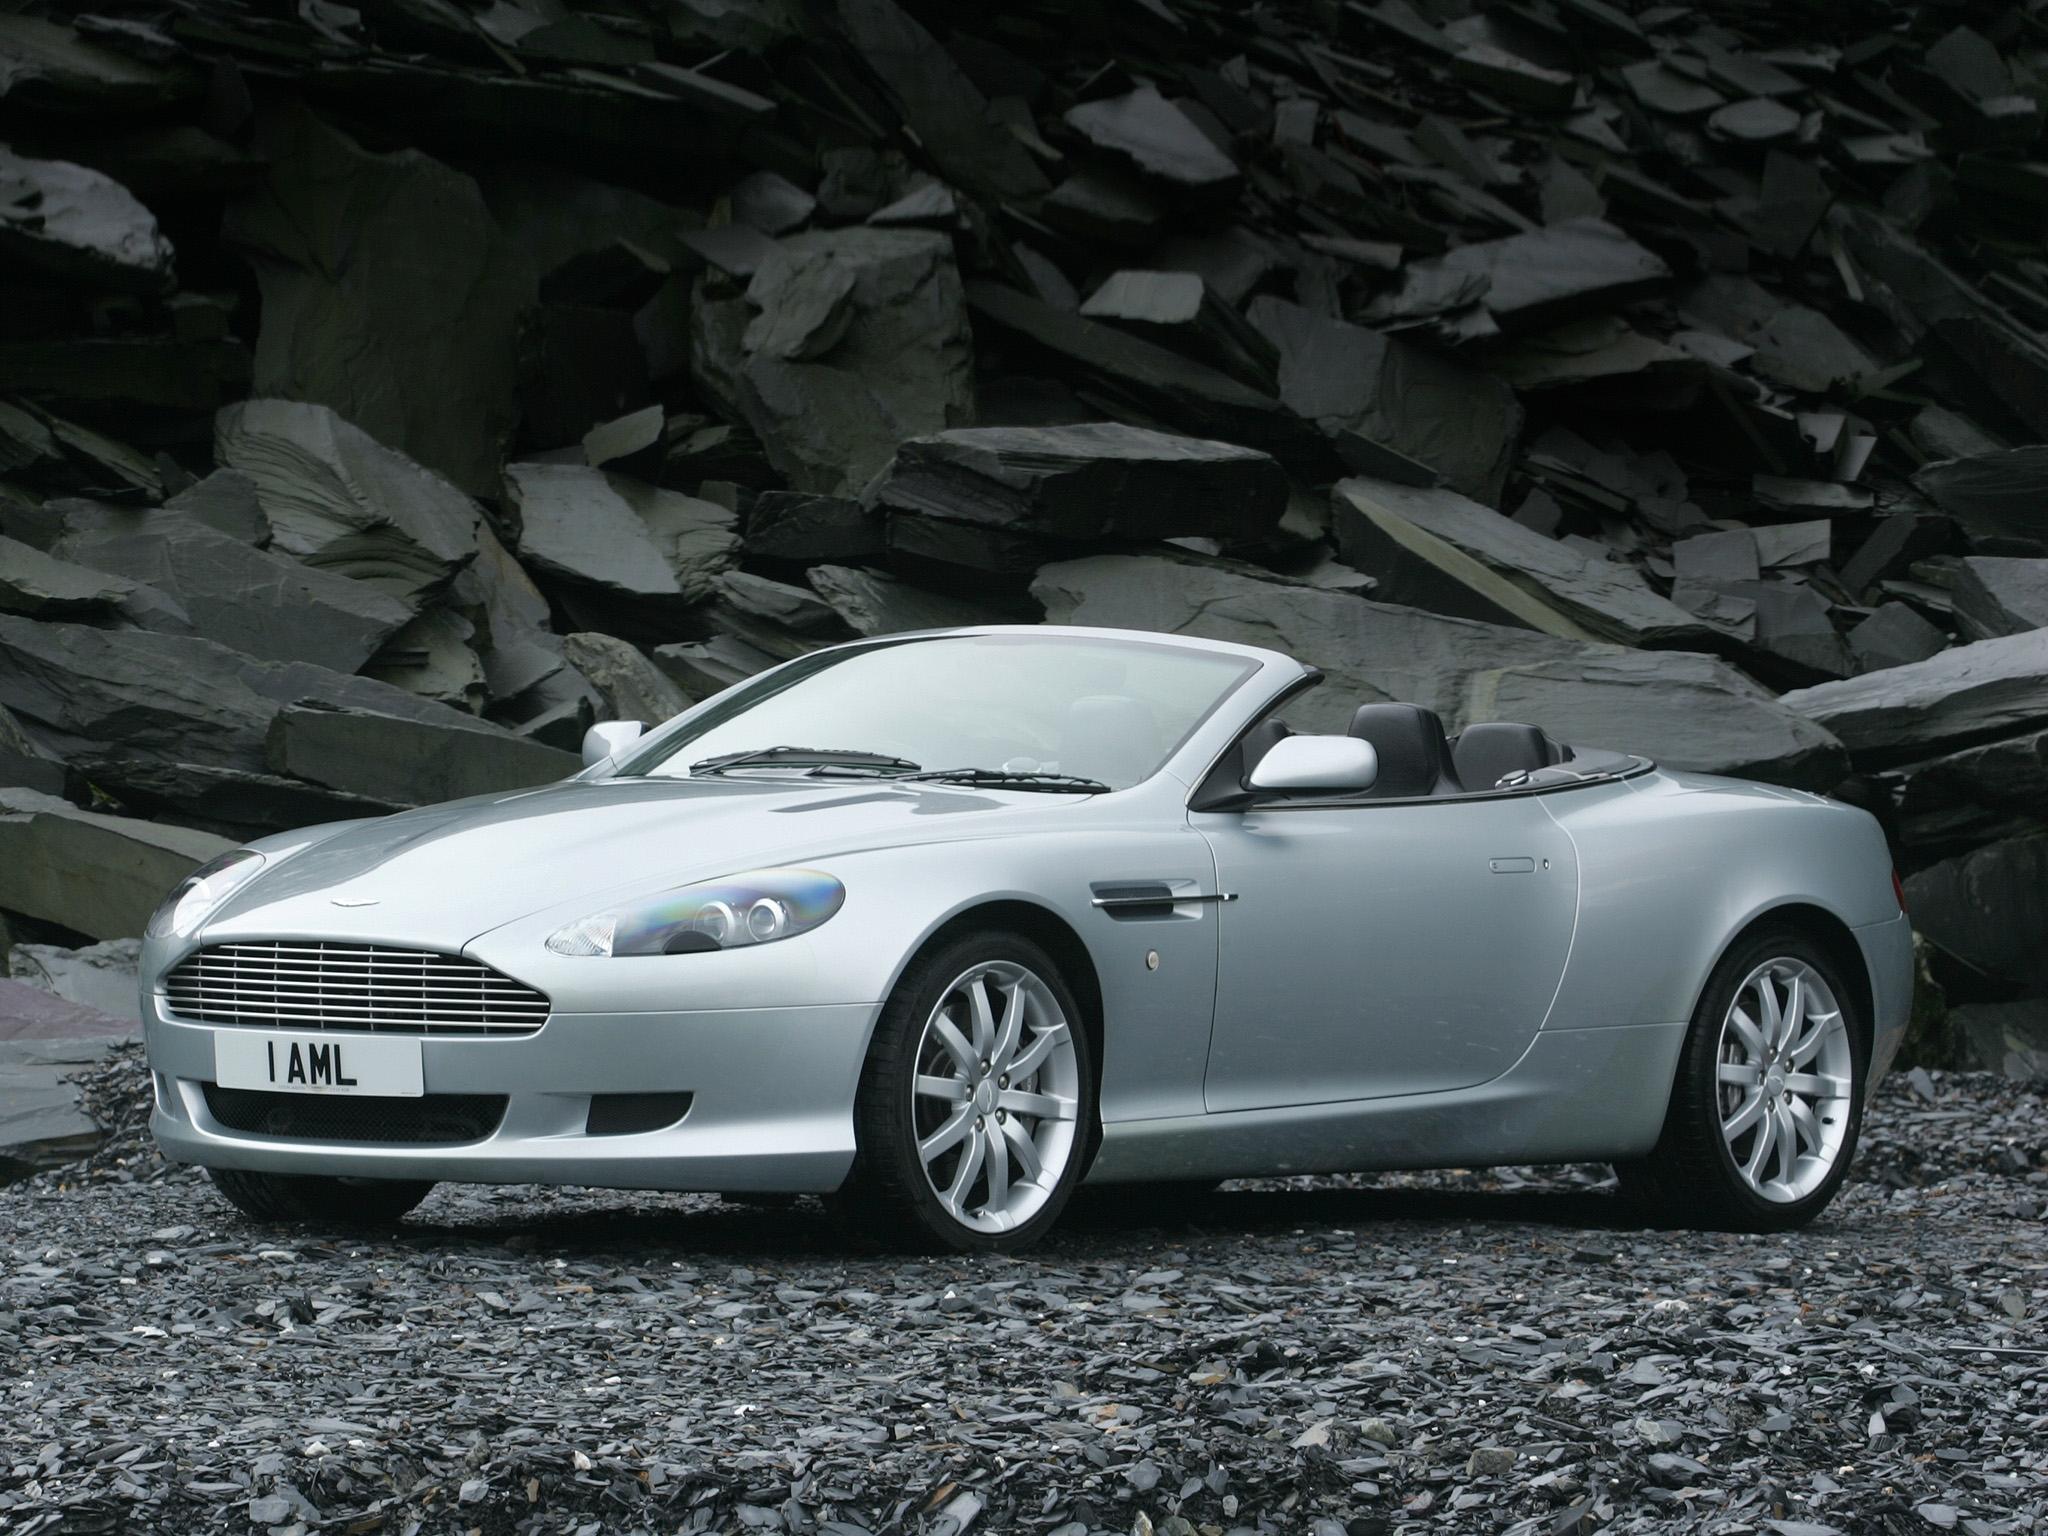 Wallpaper sport sports car Aston Martin Aston Martin DBS coupe